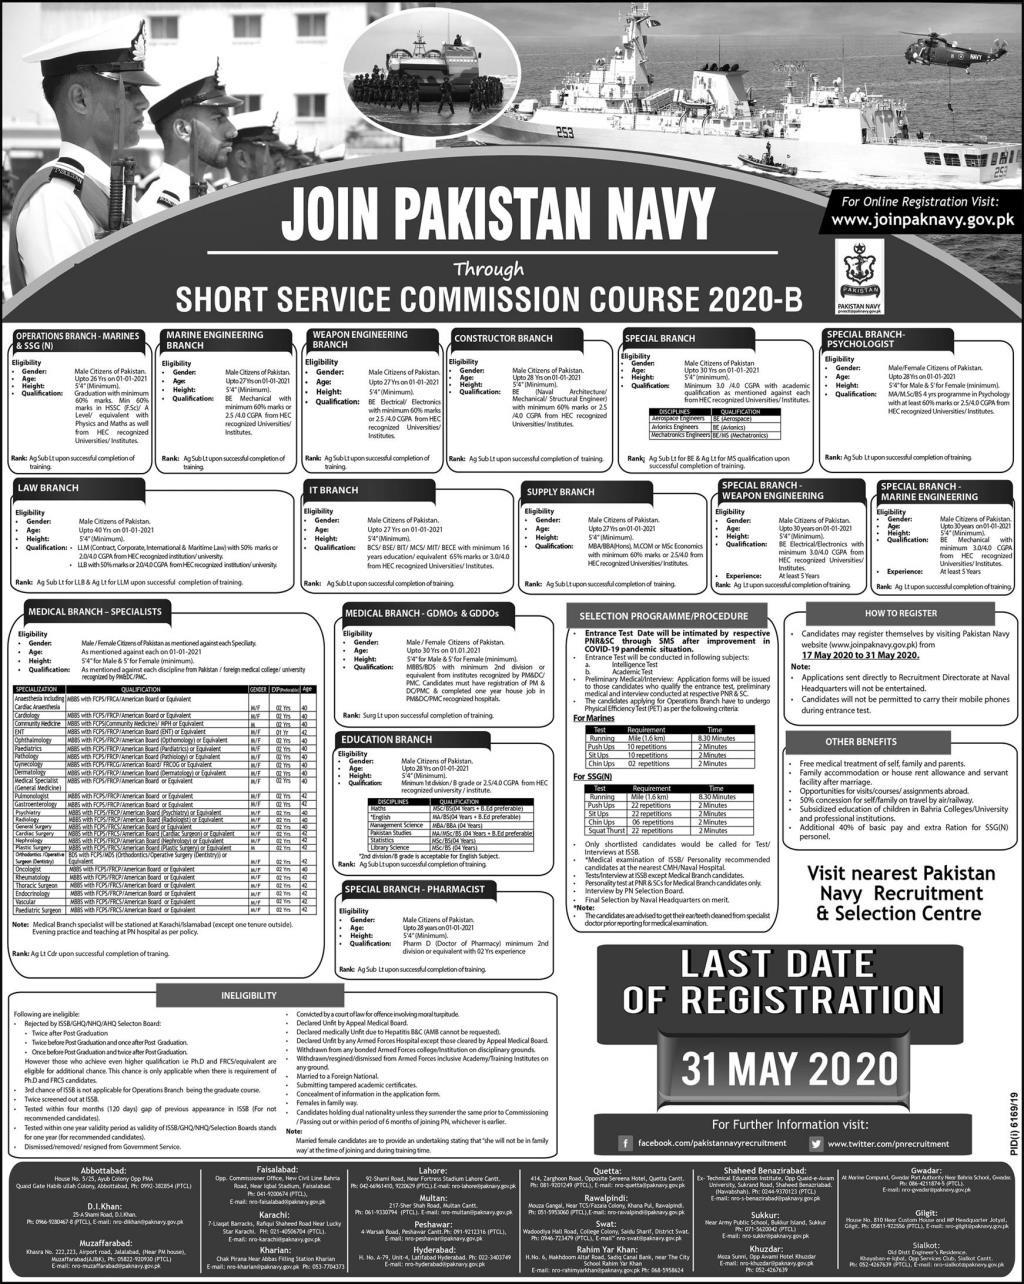 Paksitan navy jobs may 2020